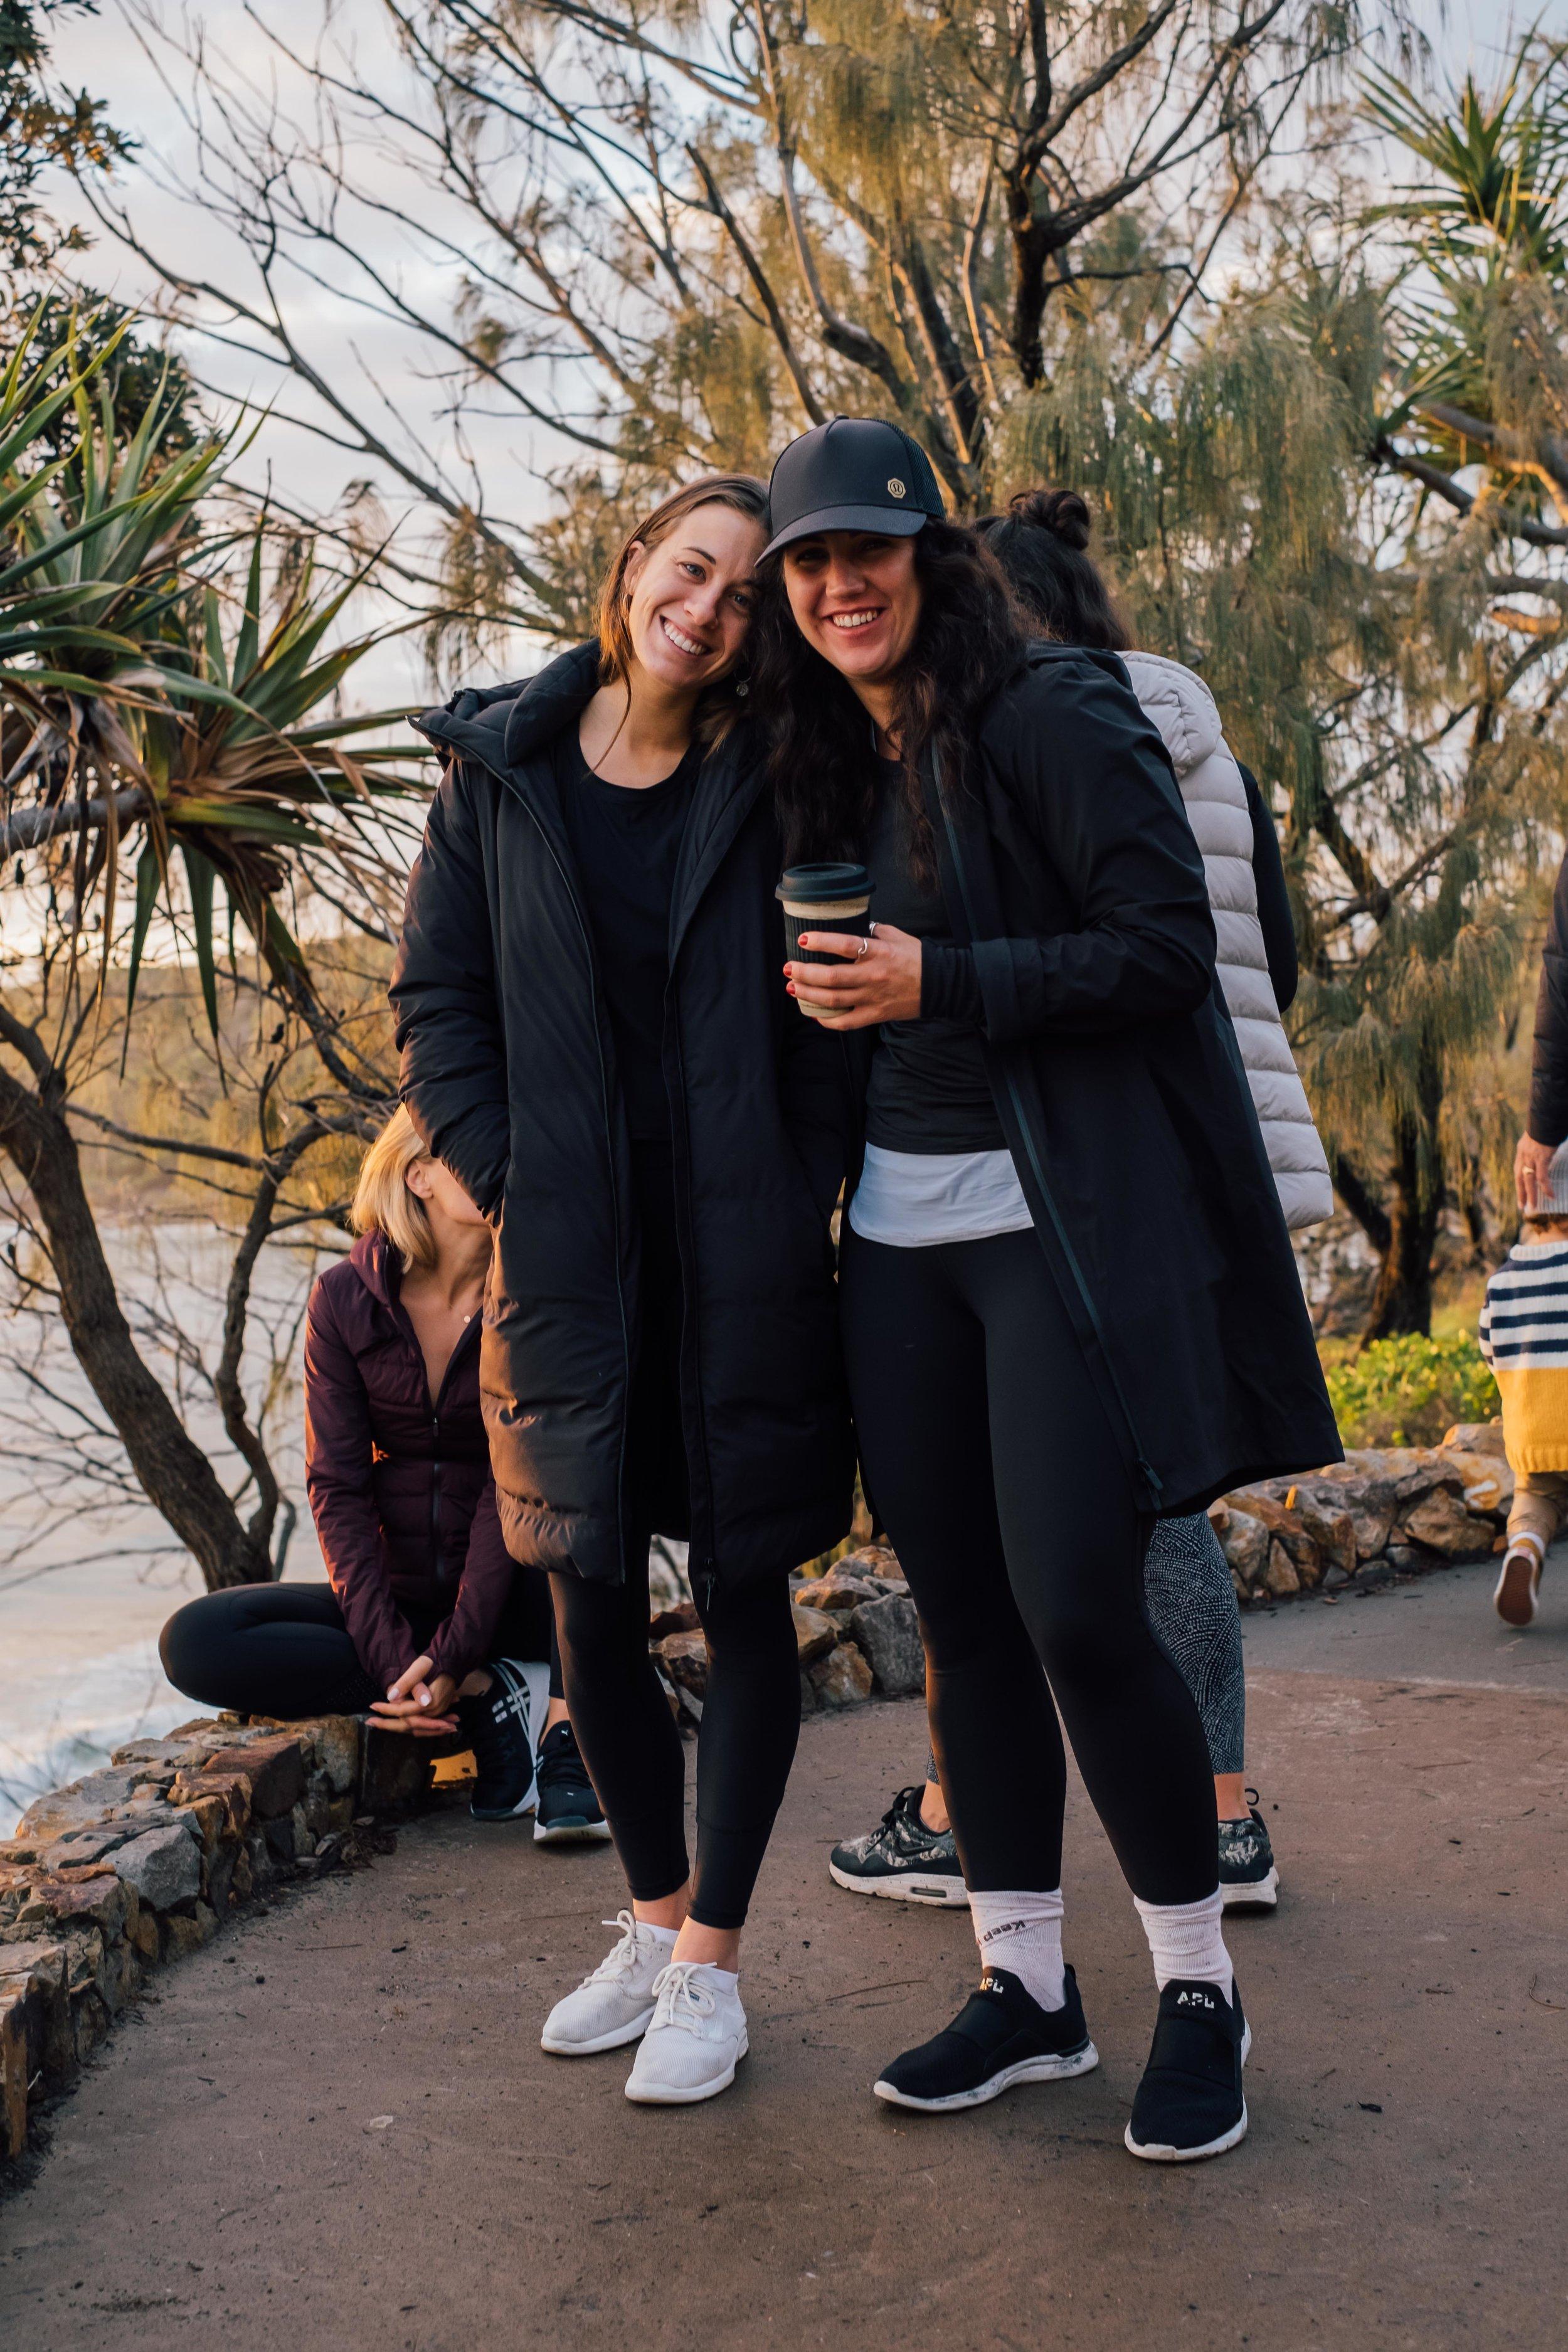 Lululemon_Outerwear Hike_2019-22.jpg